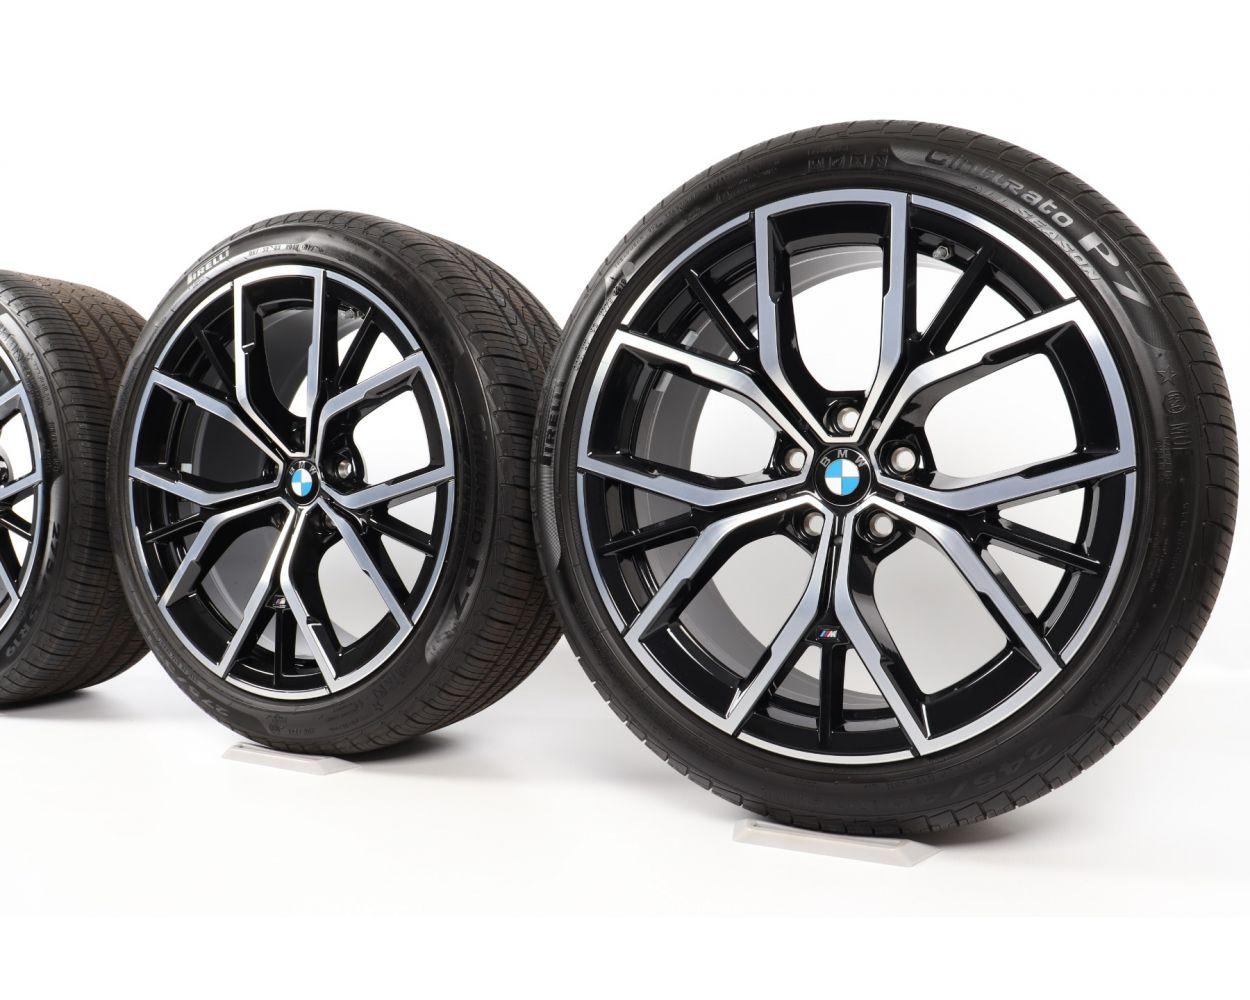 Bmw Summer Wheels 5er G30 G31 19 Zoll 664 M Double Spoke R